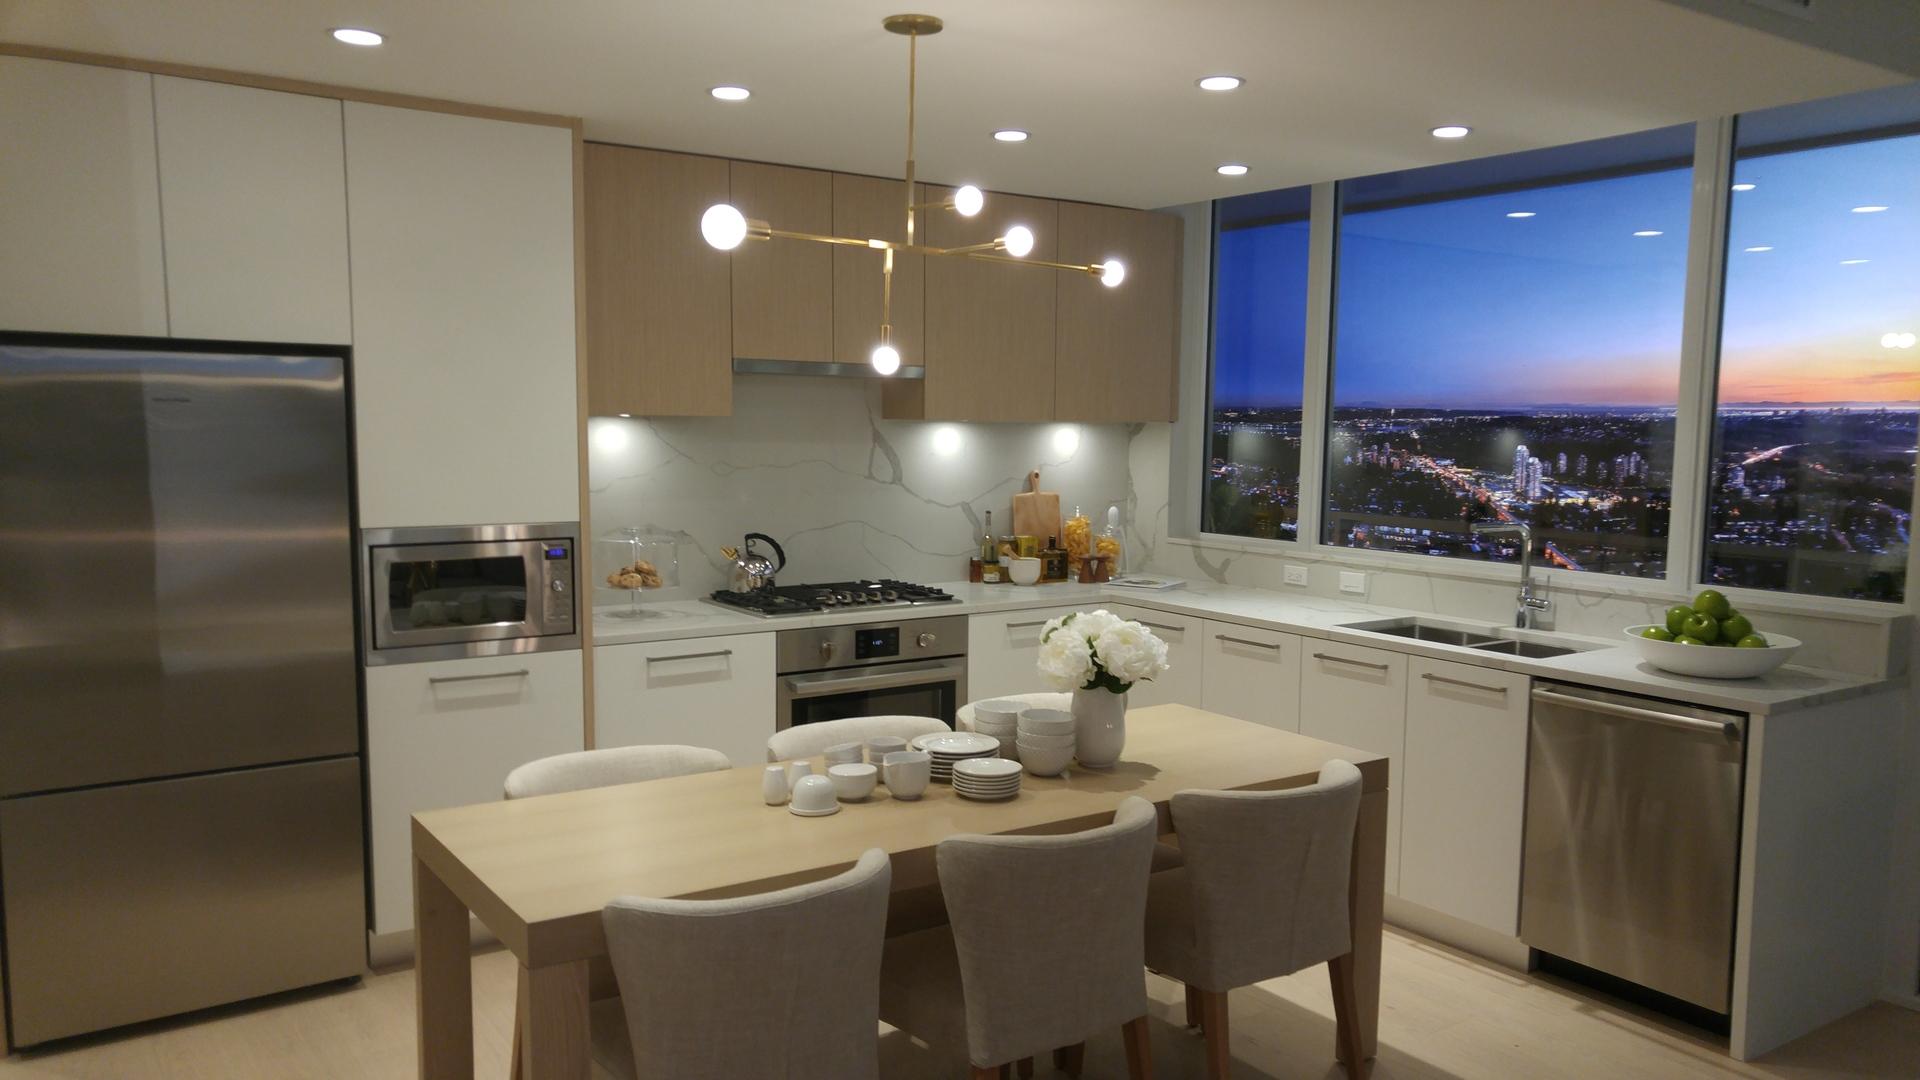 567-clarke-como-l-plan-kitchen-light-colour-scheme at 567 Clarke and Como (567 Clarke Road, Coquitlam West, Coquitlam)